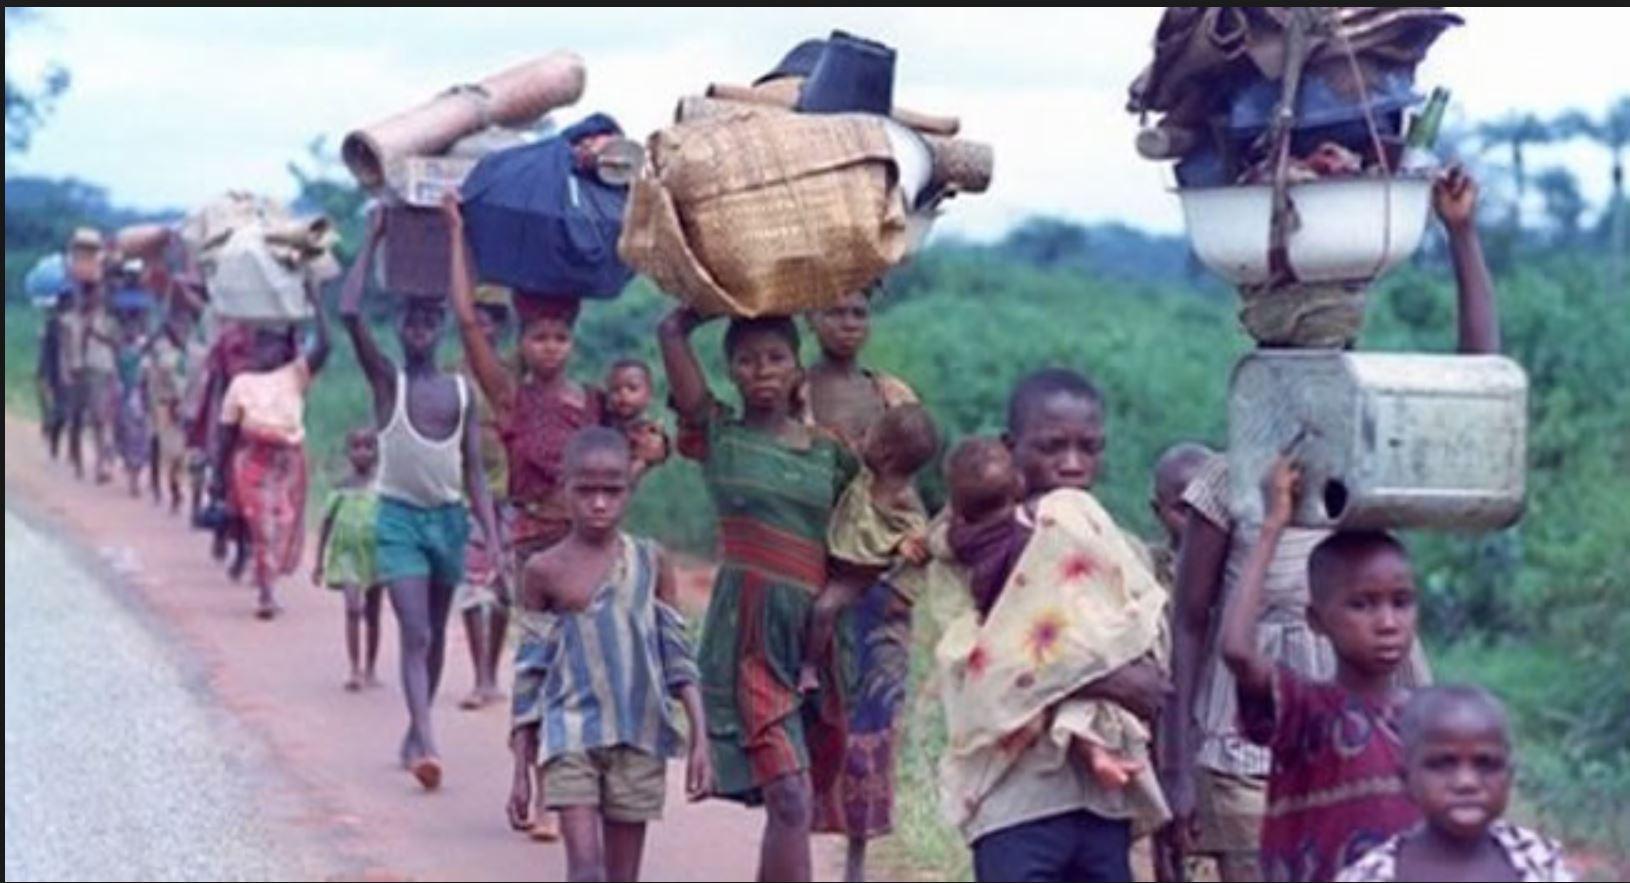 Cameroonians